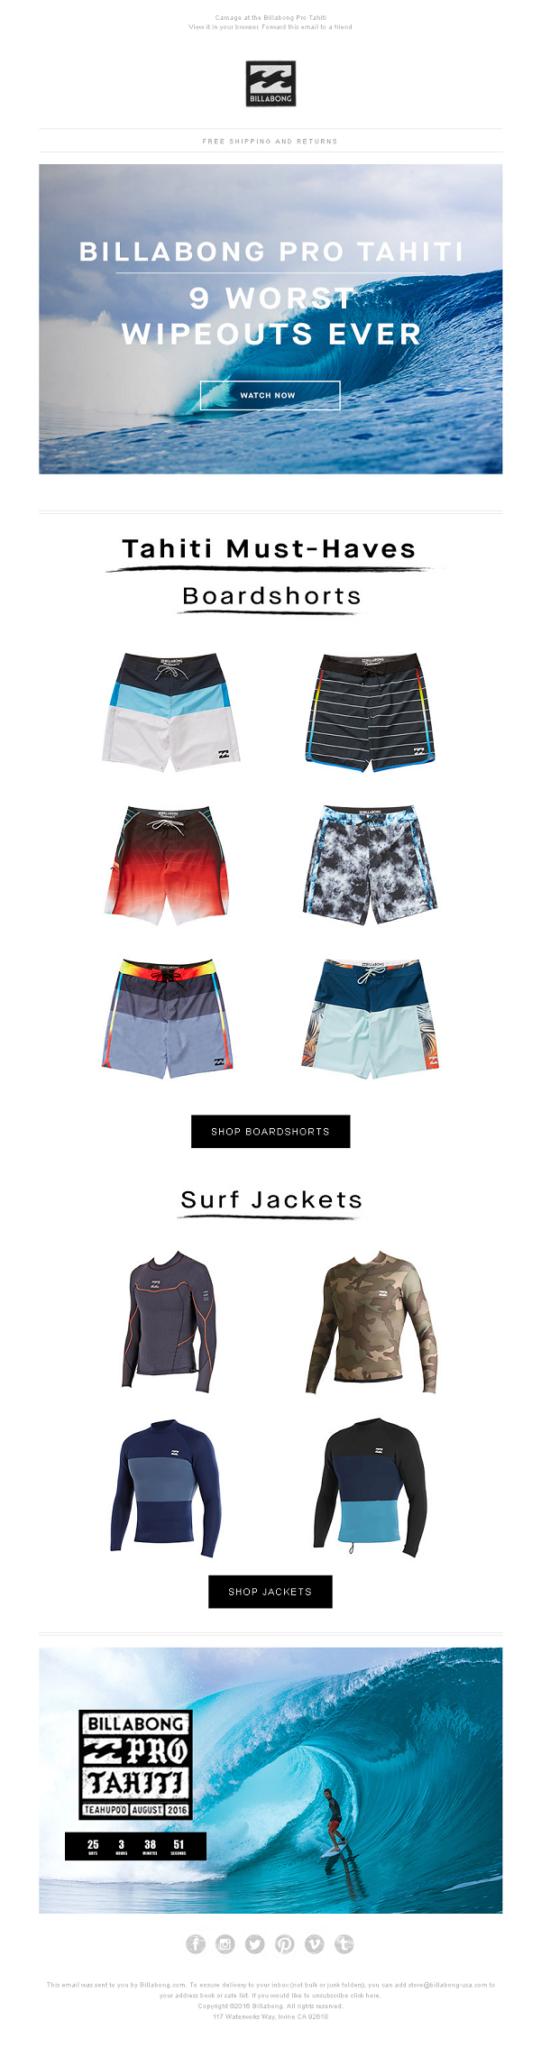 Billabong summer email campaign design